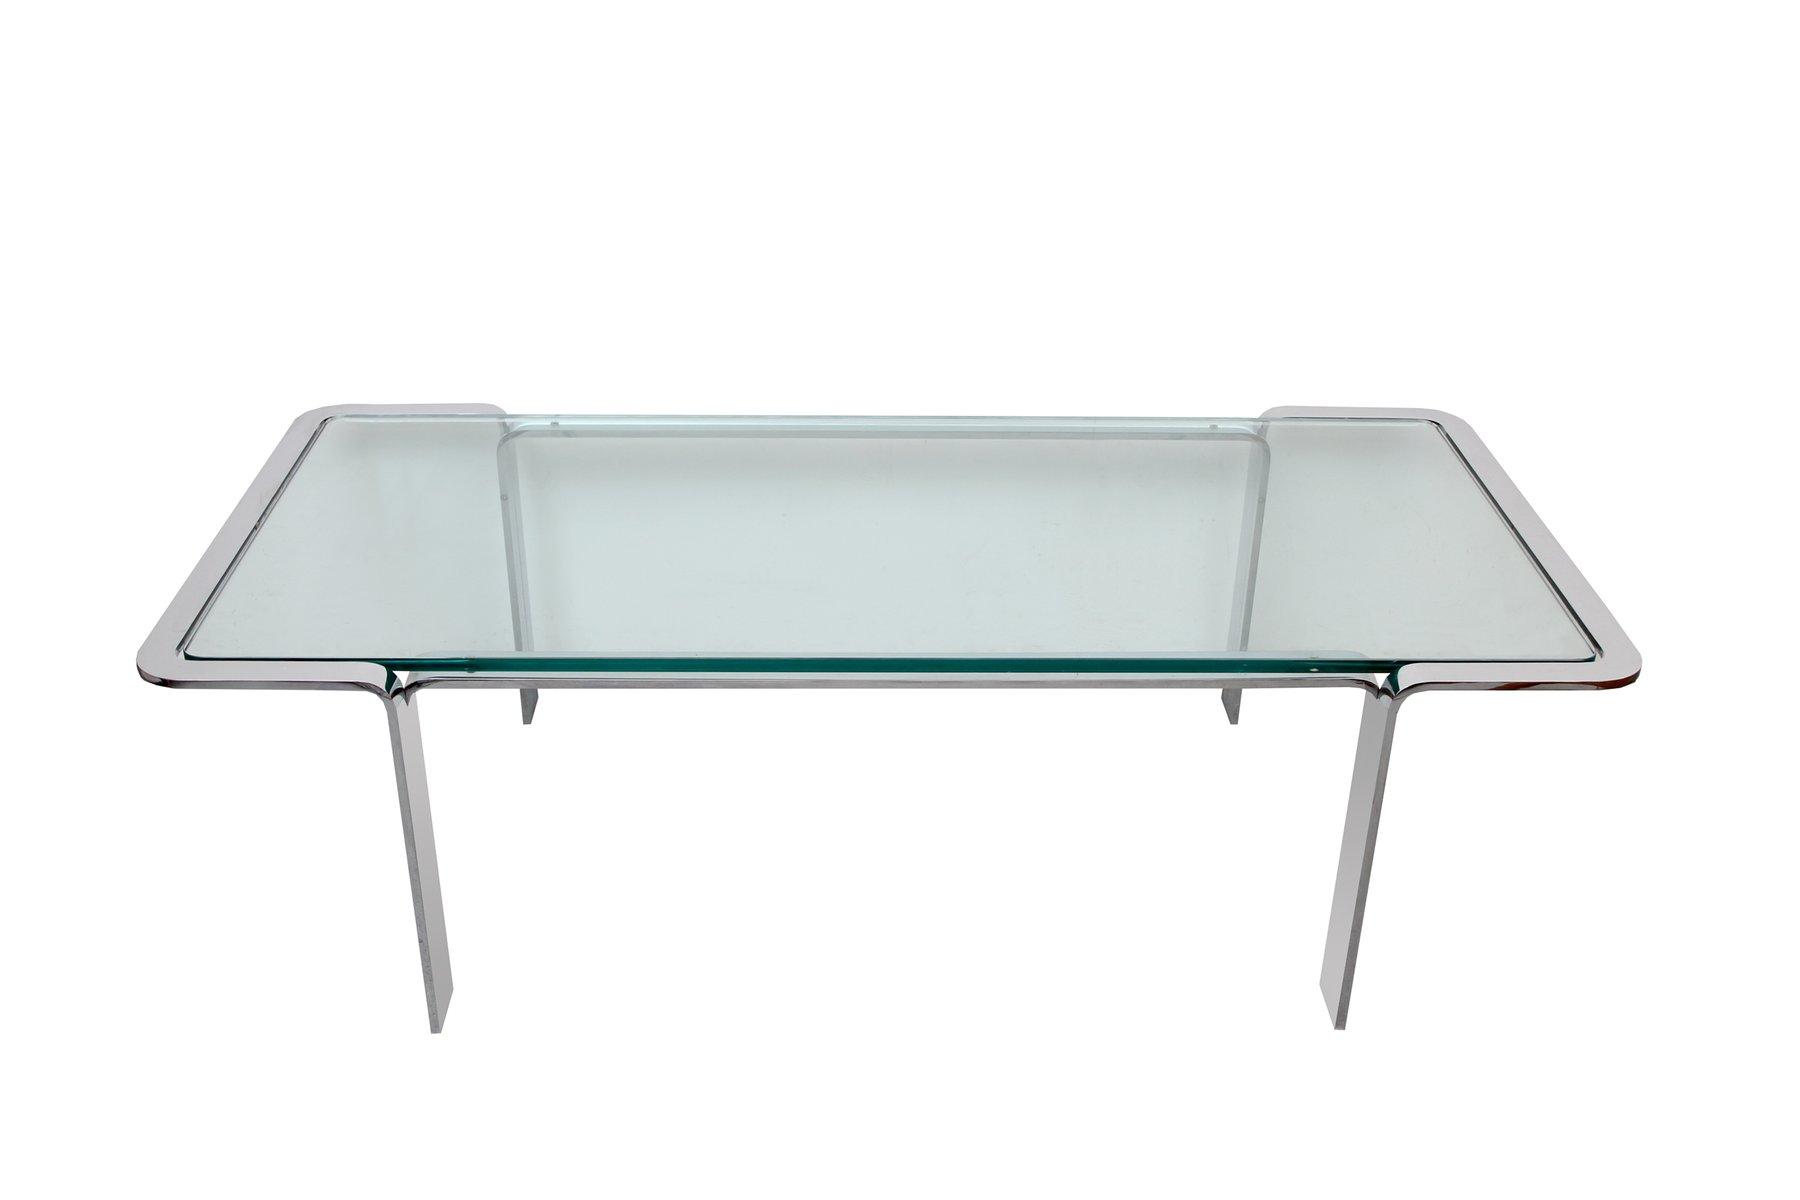 German Chrome Glass Coffee Table 1970s For Sale At Pamono